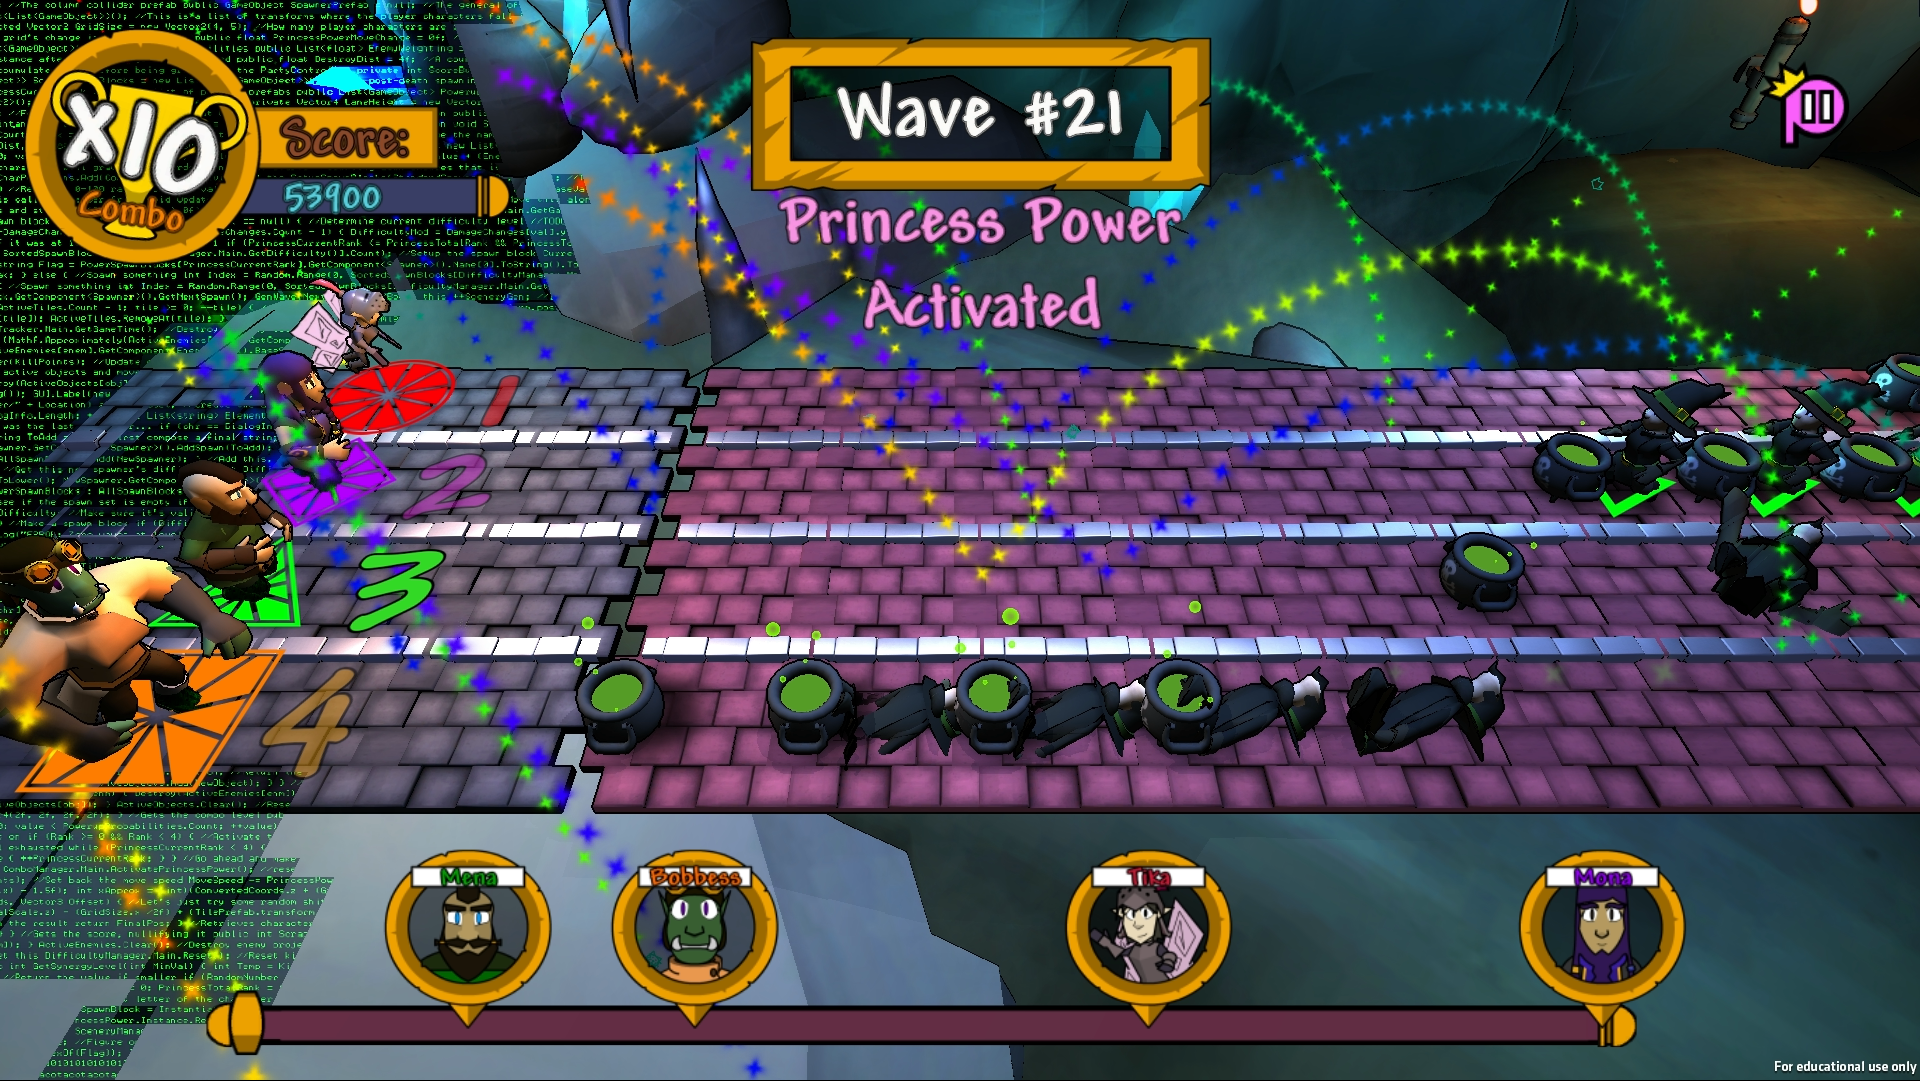 Gameplay (Princess Power)